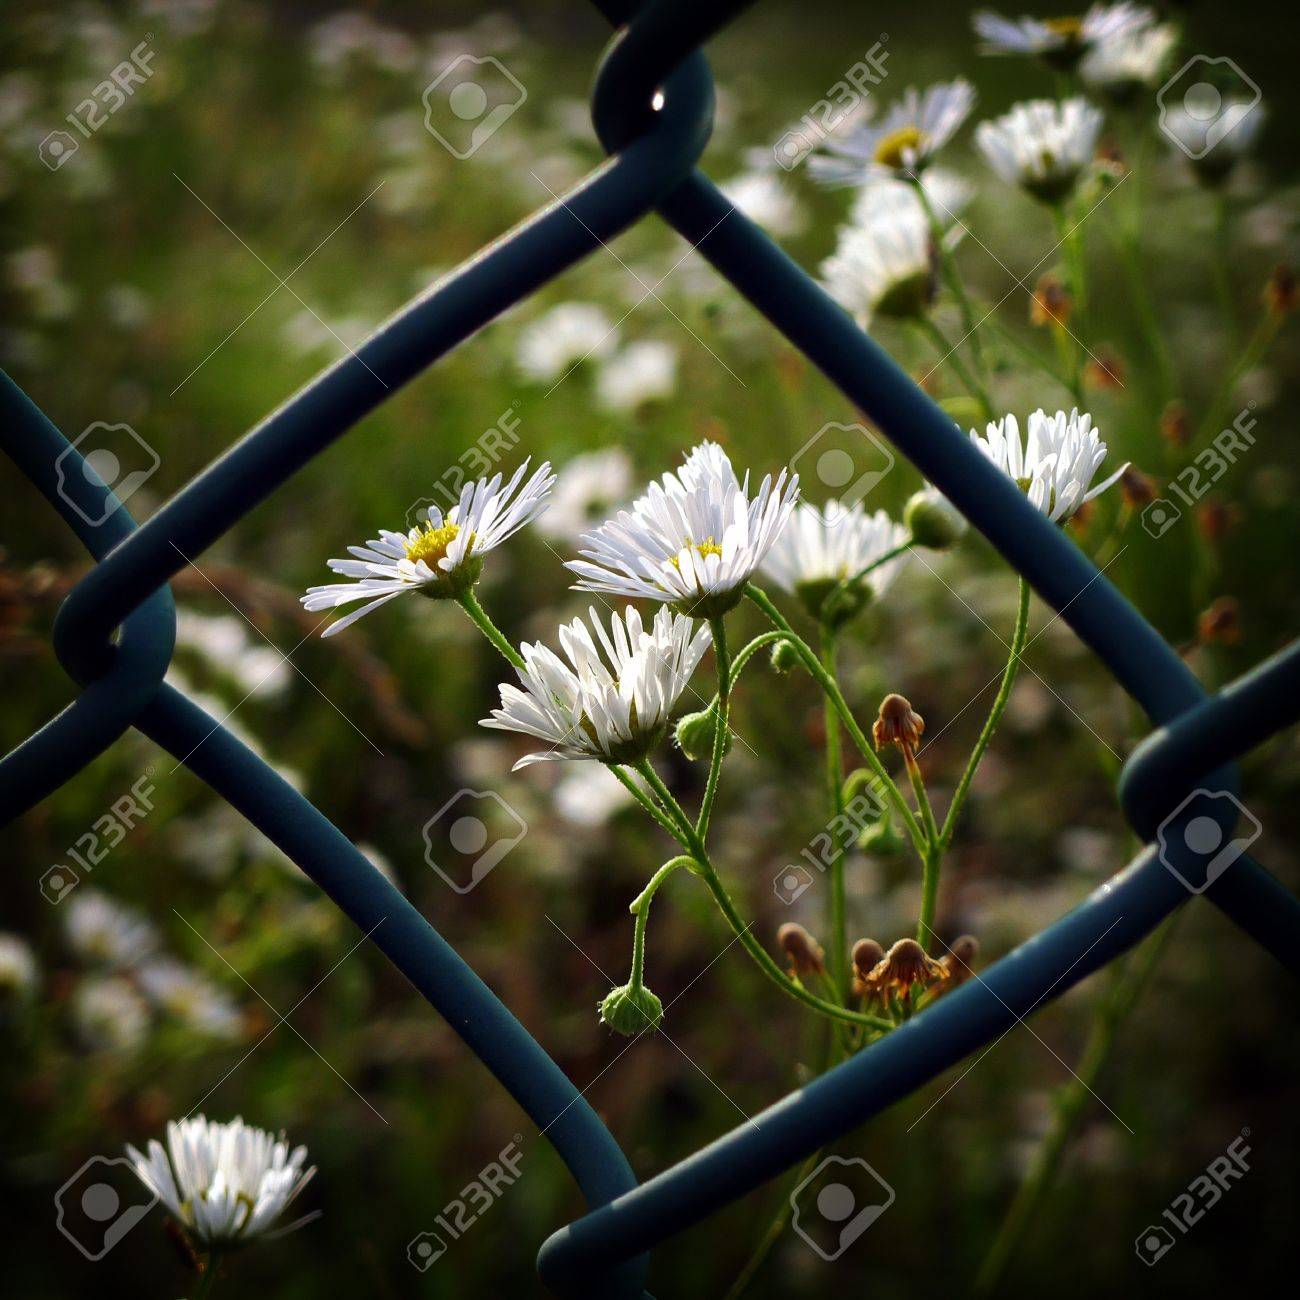 Tiny white flowers beyond the lattice fence stock photo picture tiny white flowers beyond the lattice fence stock photo 7379021 dhlflorist Image collections